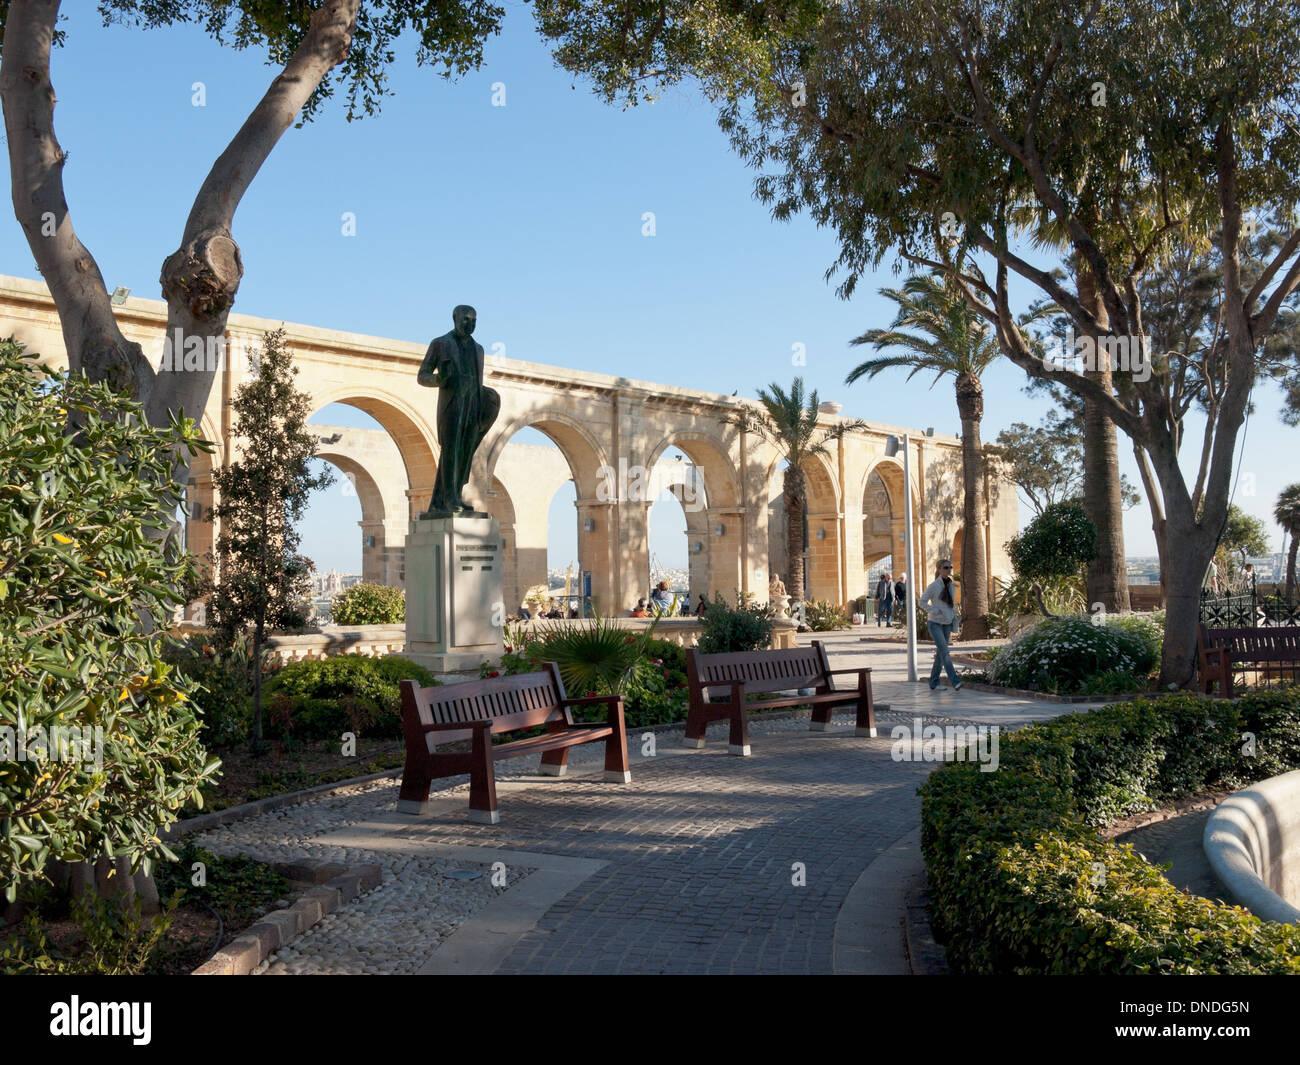 La Valette Jardins Upper Barraca